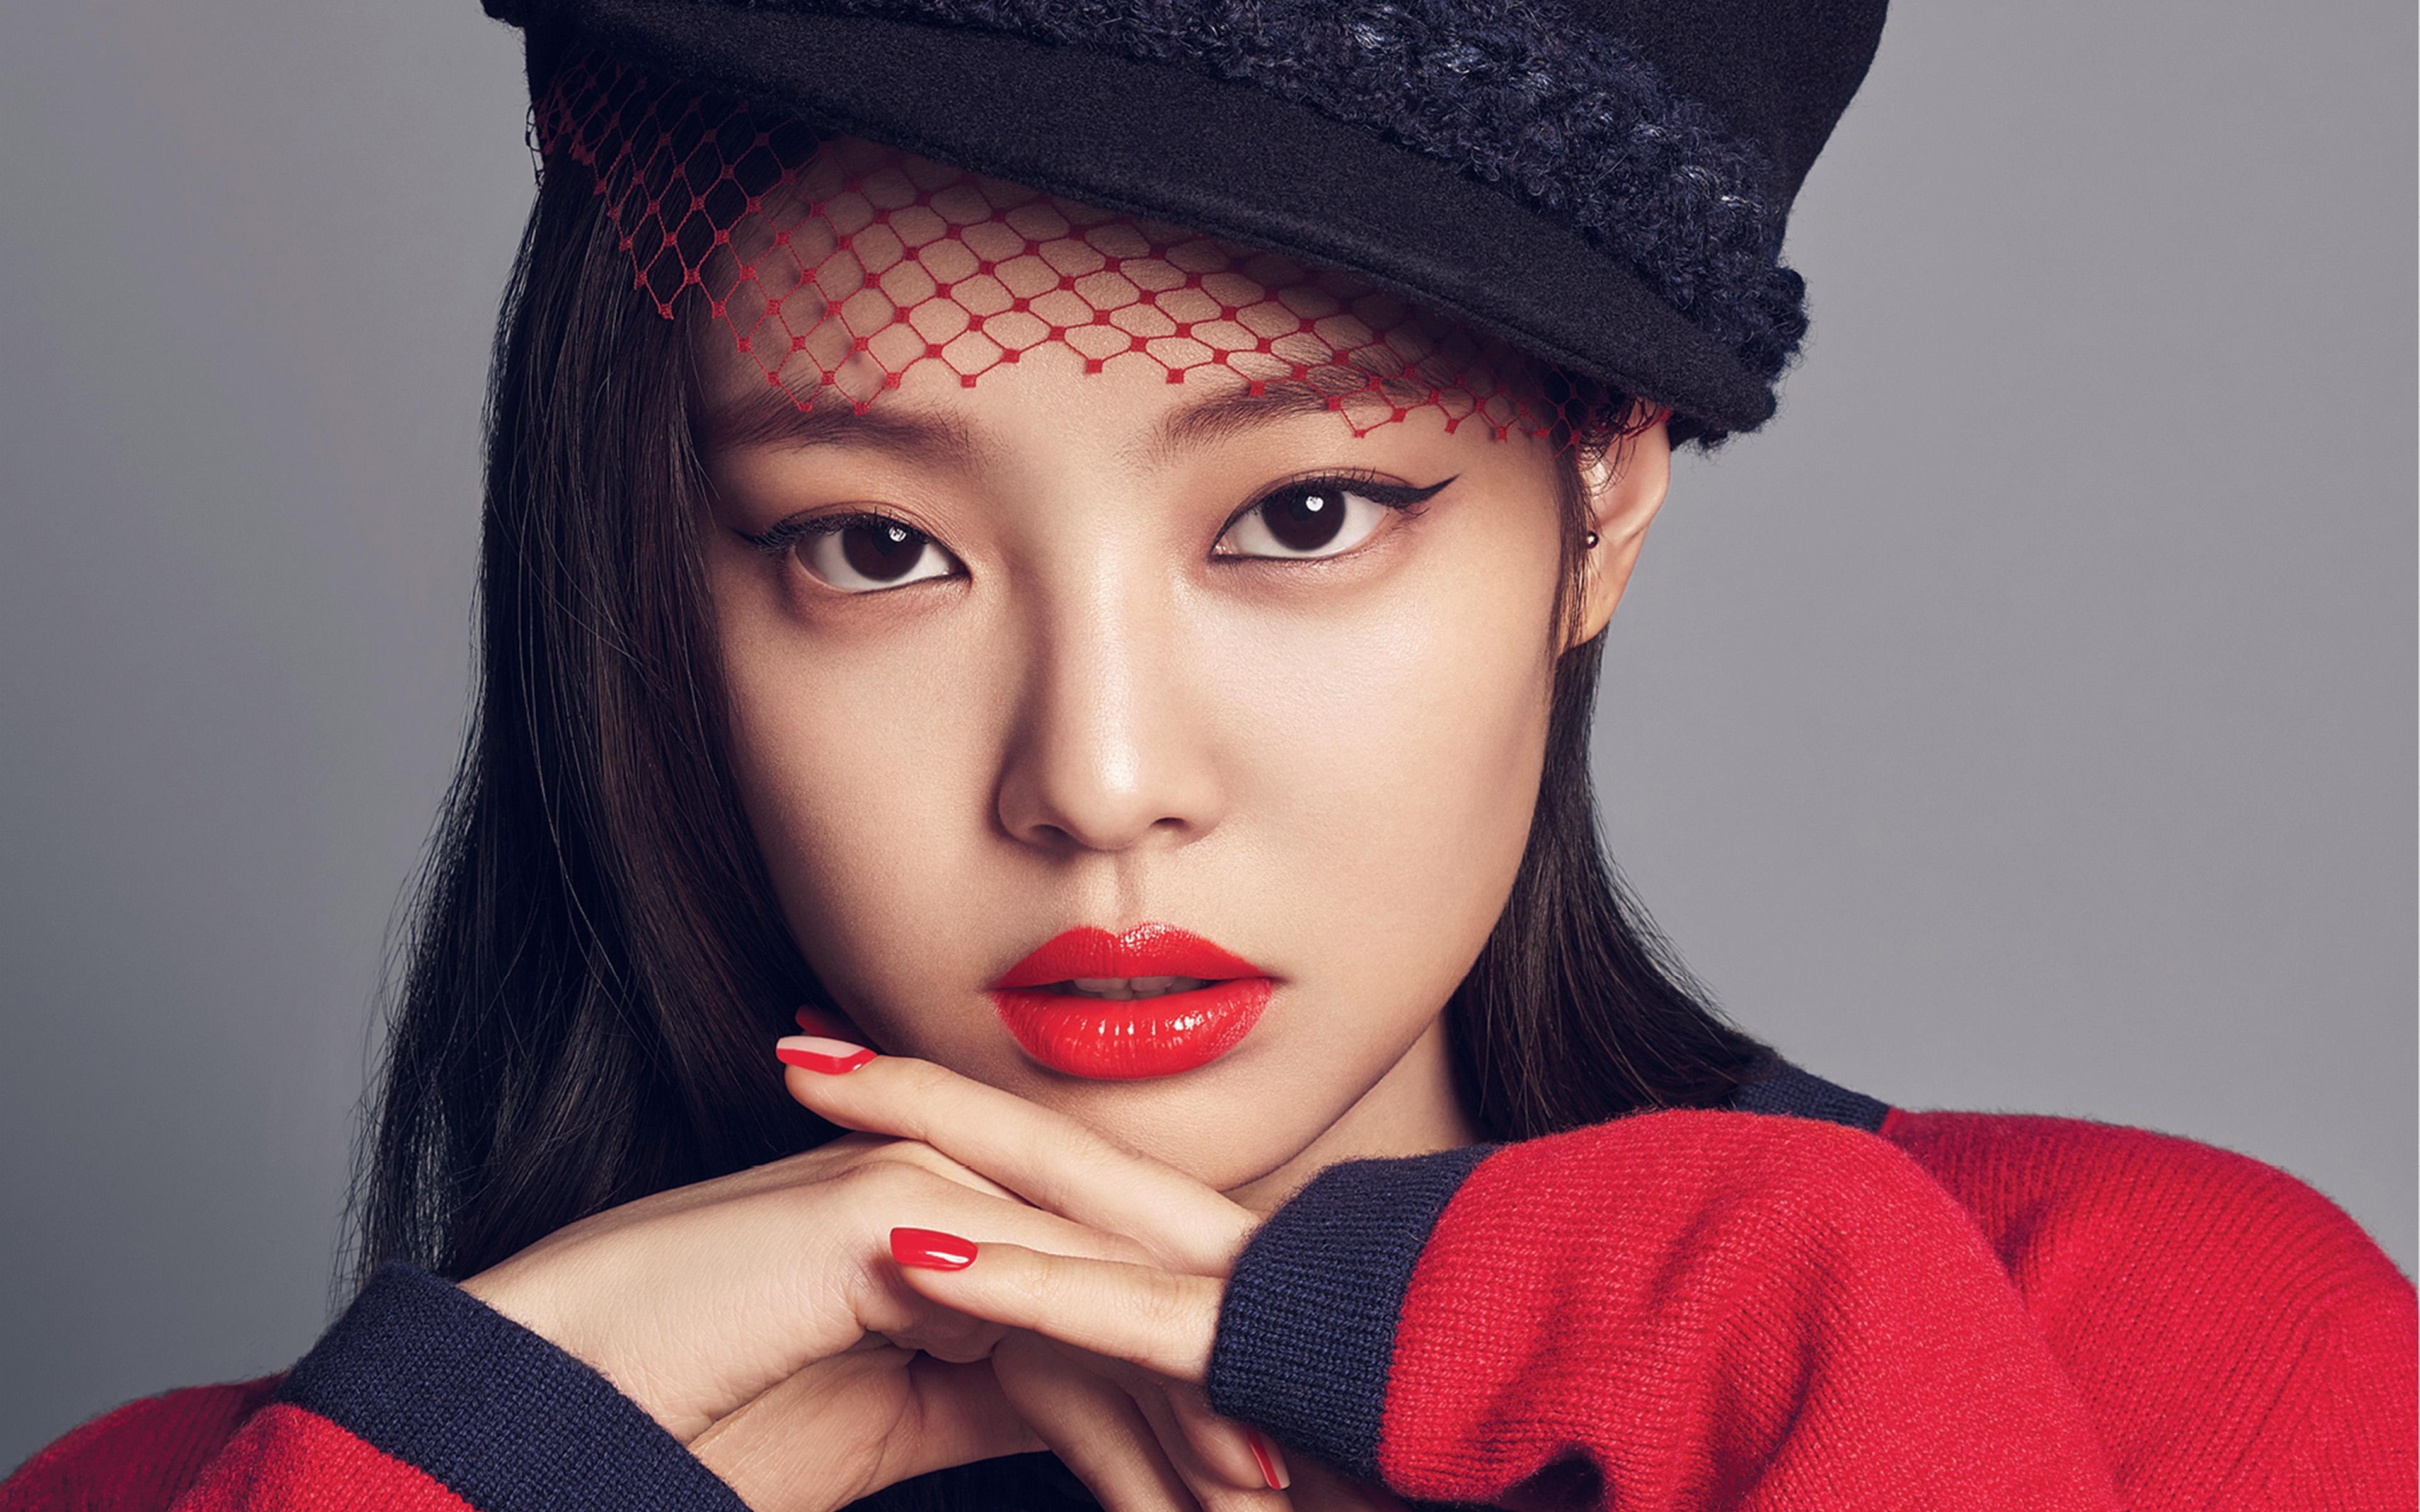 I Love Papers Hp37 Blackpink Girl Kpop Jennie